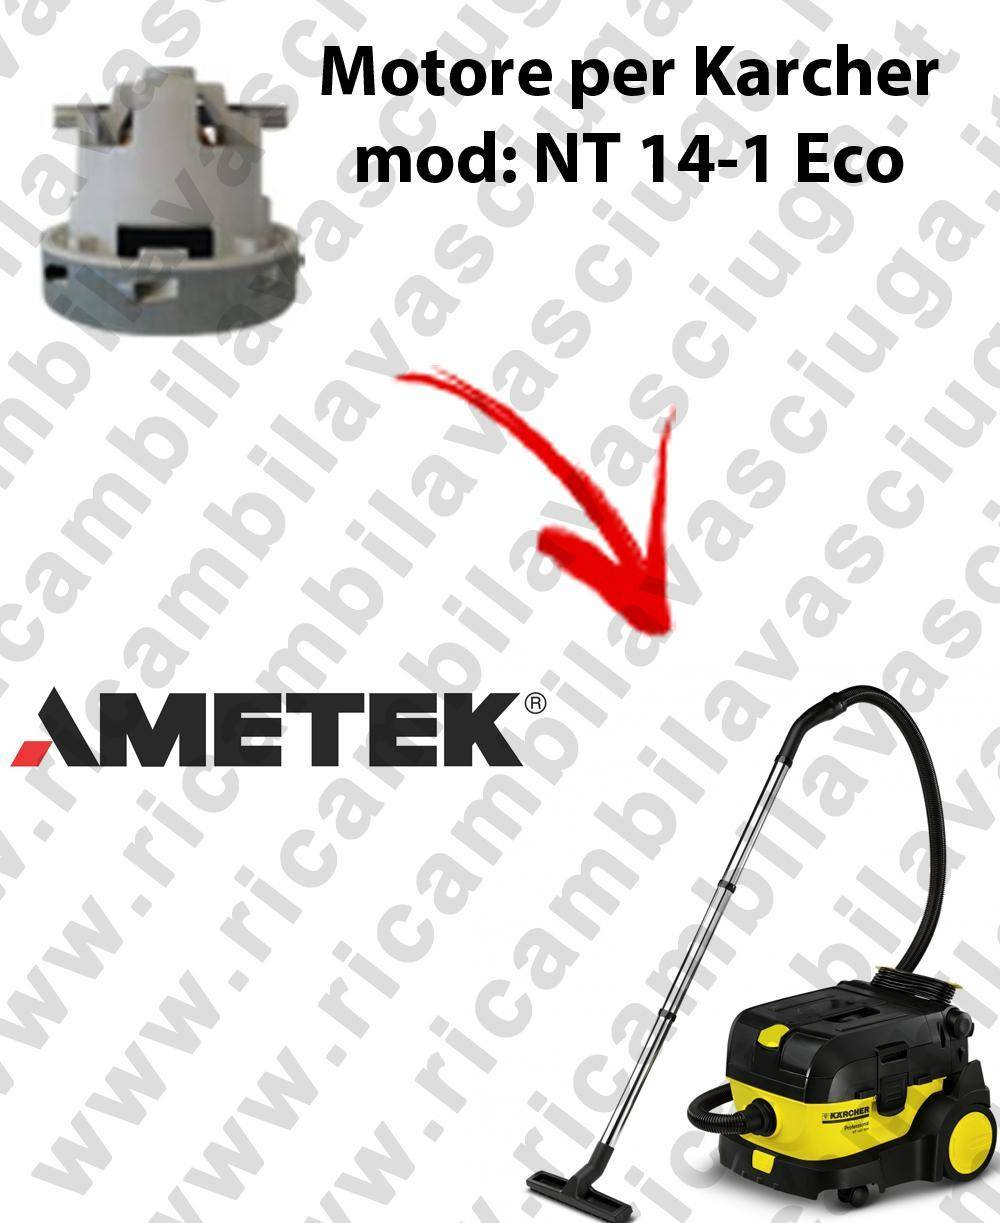 Karcher NT 14-1 Eco MOTORE aspirazione AMETEK per aspirapolvere